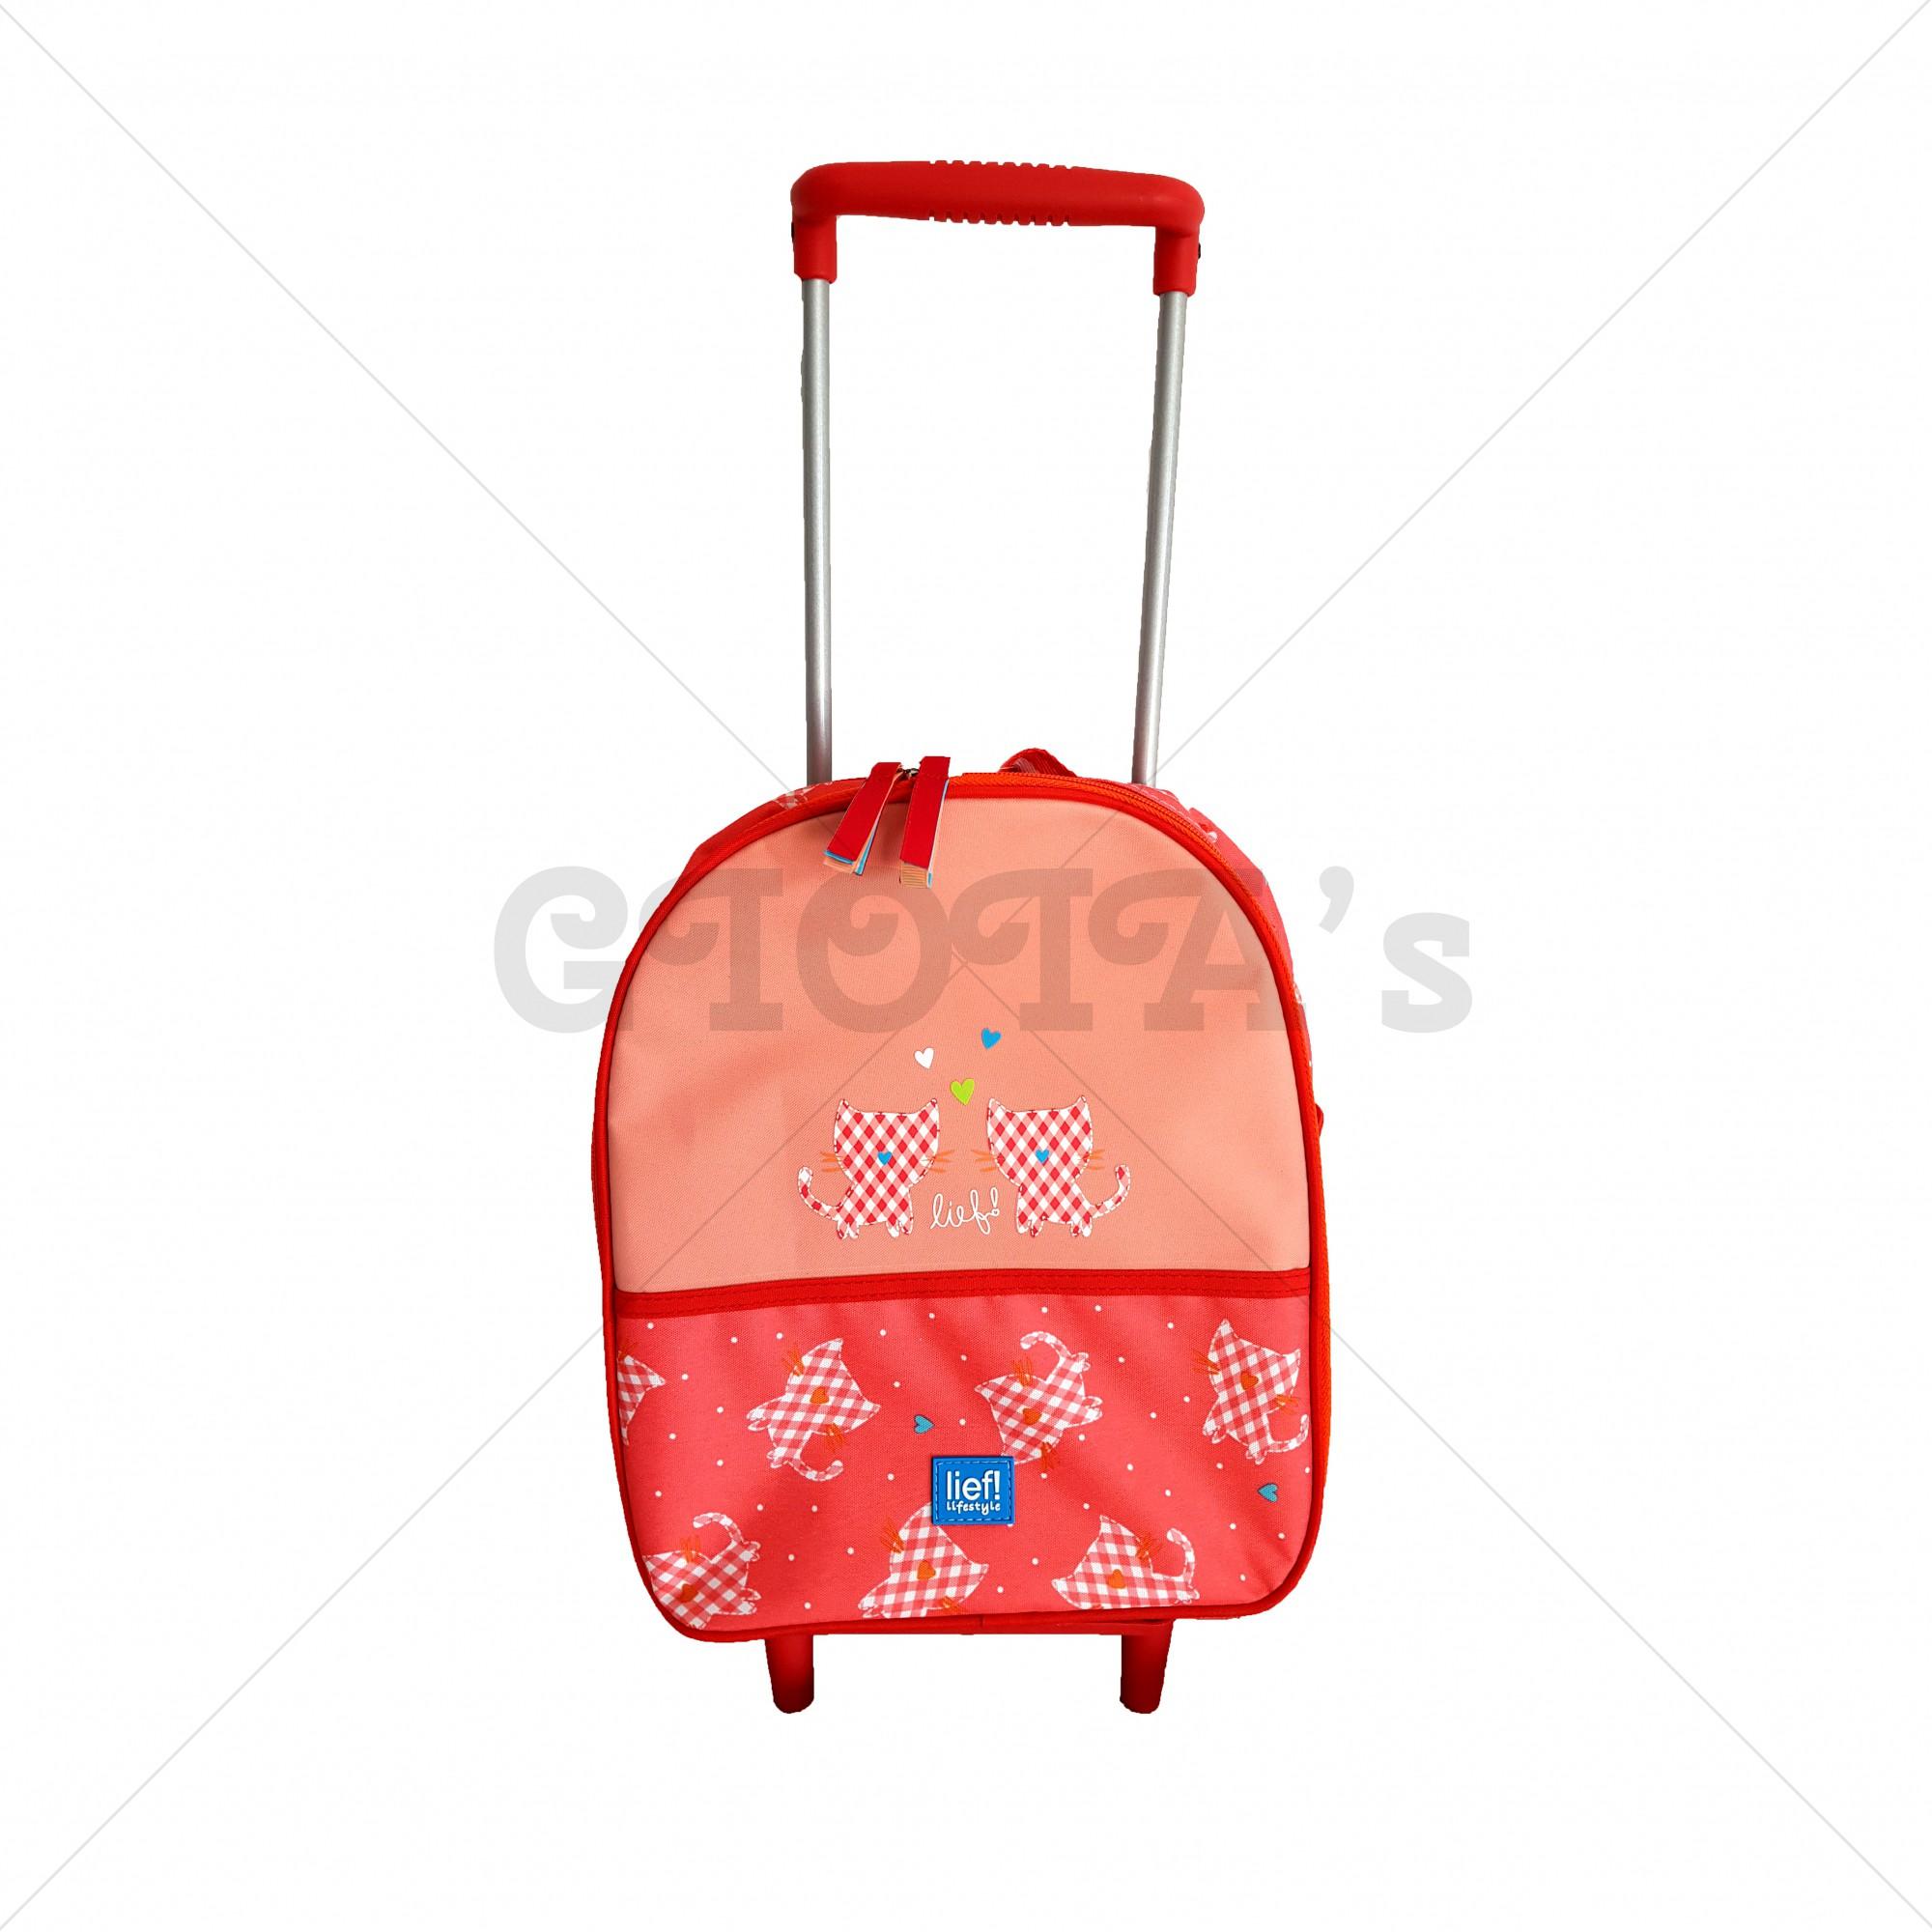 e90760fb456 Lief! lifestyle trolley mandarijnrood-zalm - GIOIA's cadeau en ...